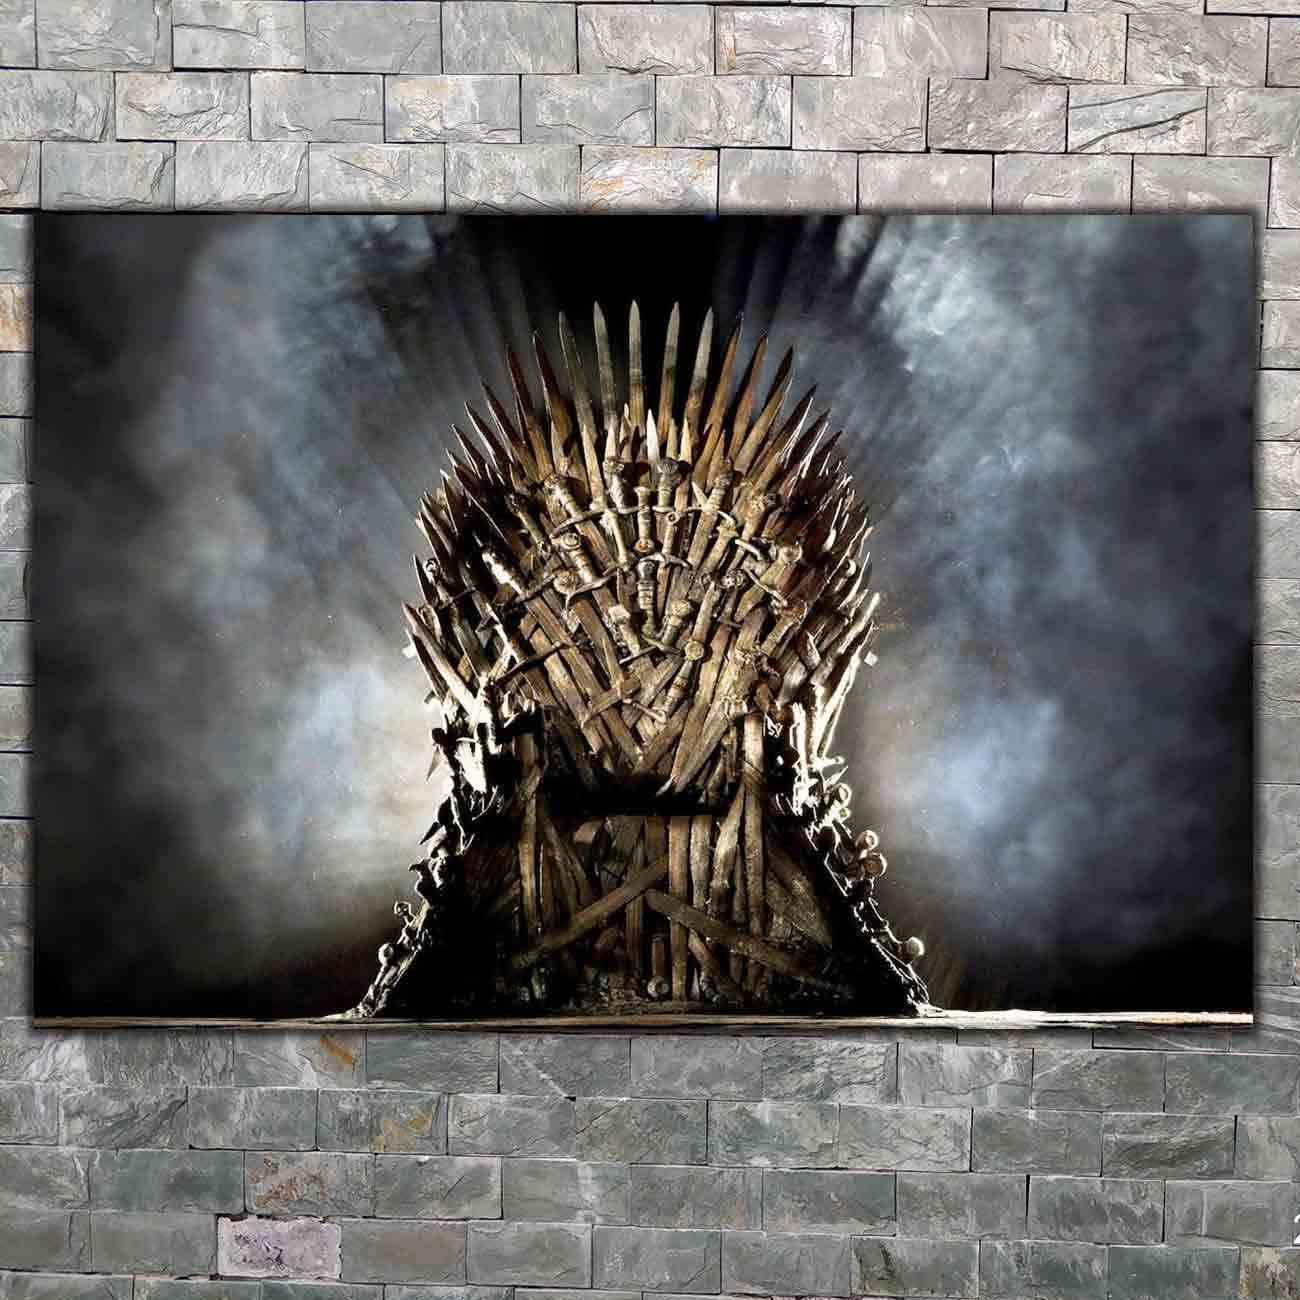 Seni Poster Thrones Jon Snow Daenerys Dinding Kanvas Cetak Lukisan Modern Rumah Decor8x12 14X21 12X18 24X36 27X40